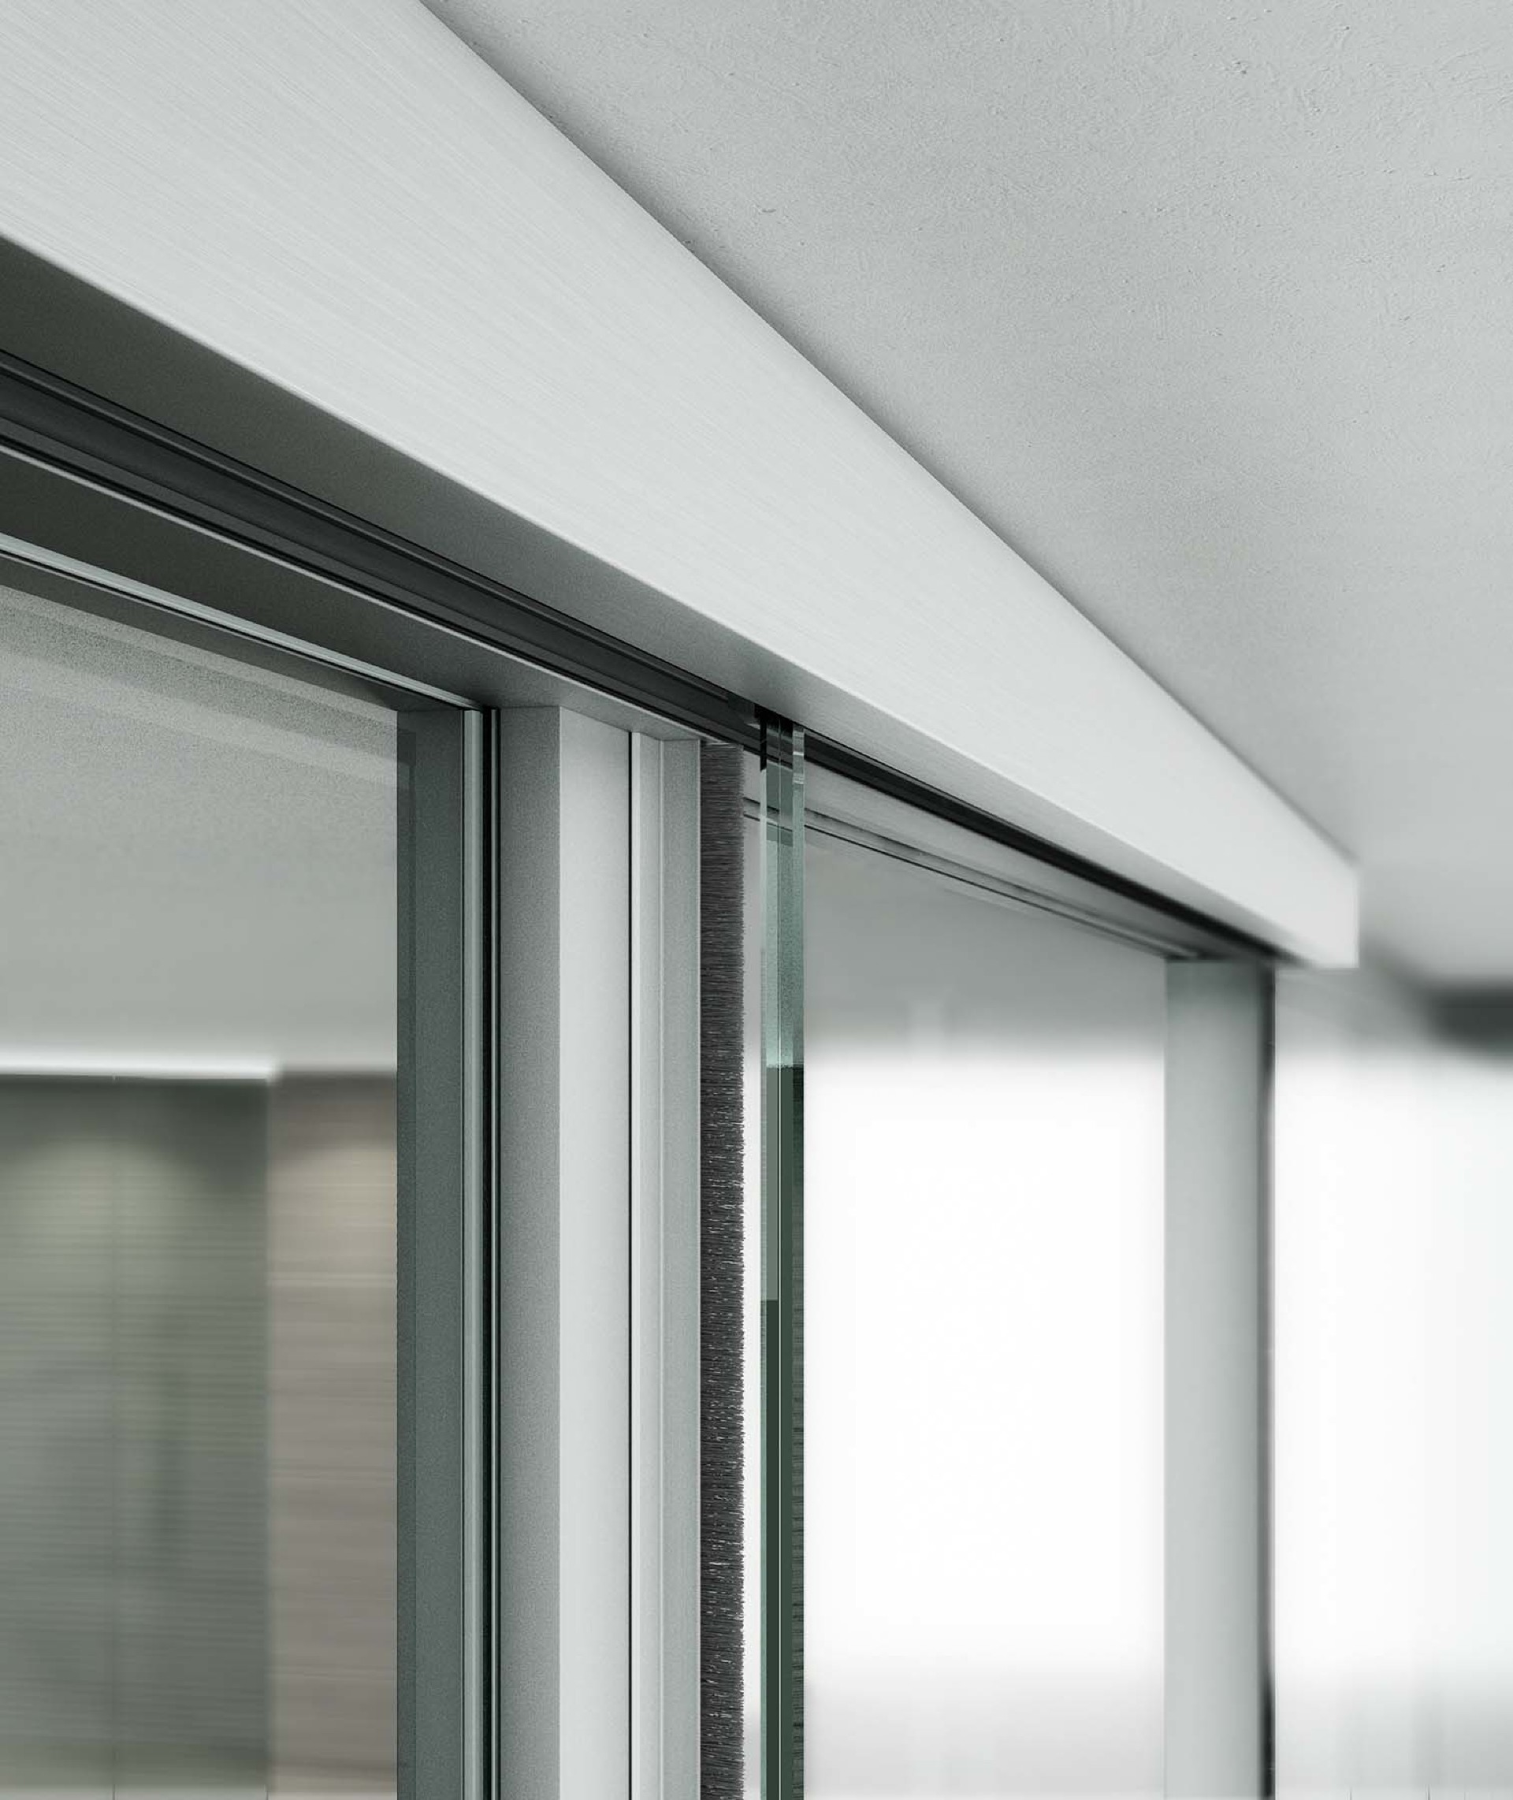 partition-glass-sliding-dwel.jpg